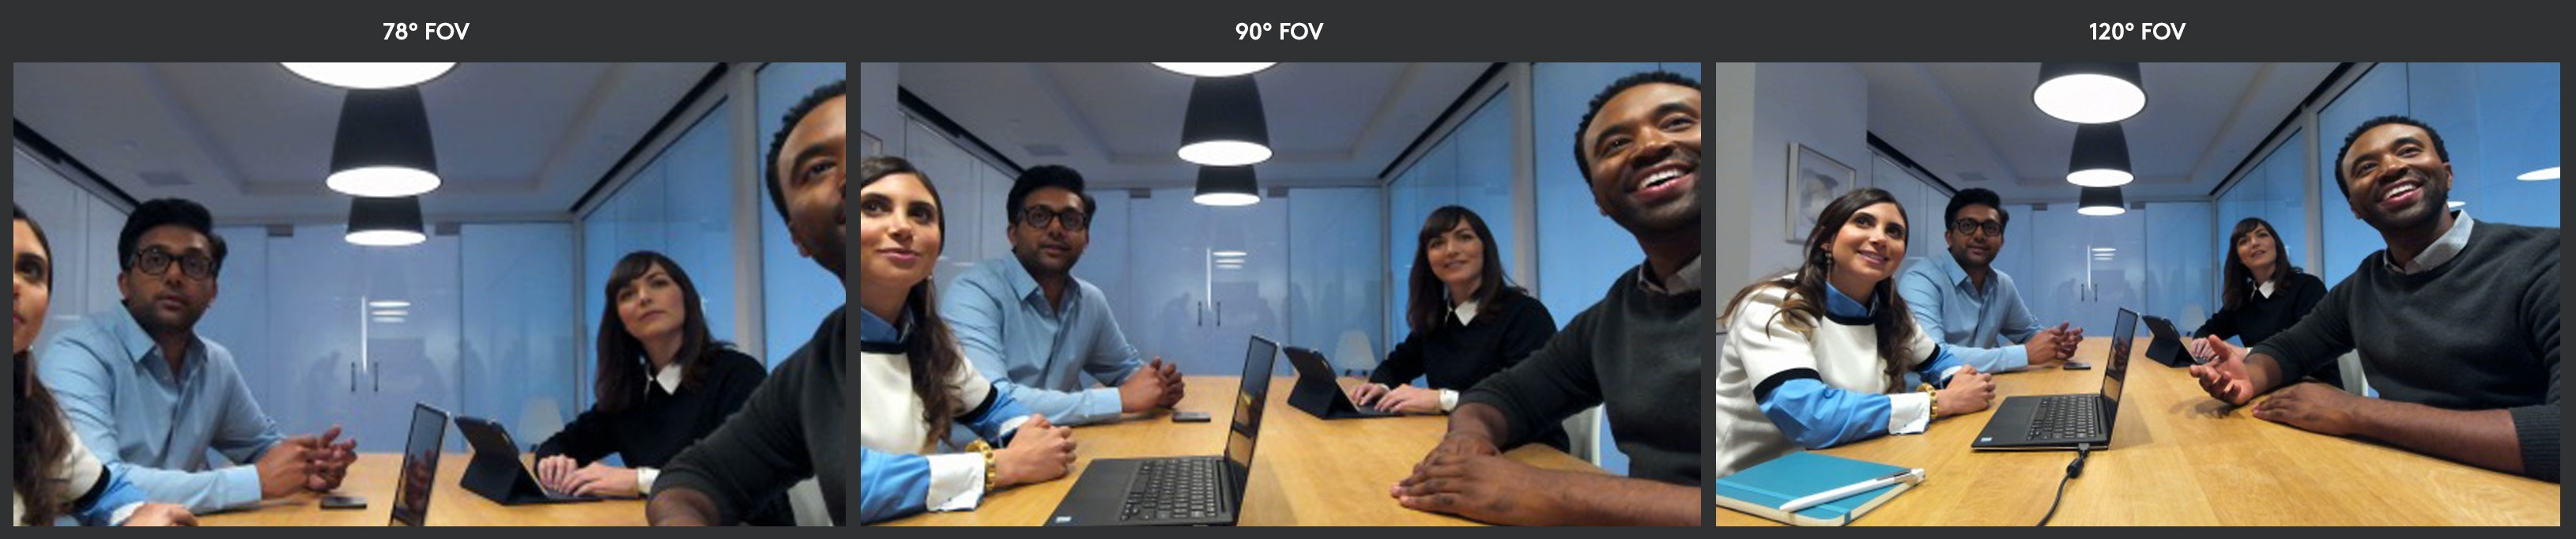 FOV_Comparison_set-2 (1)